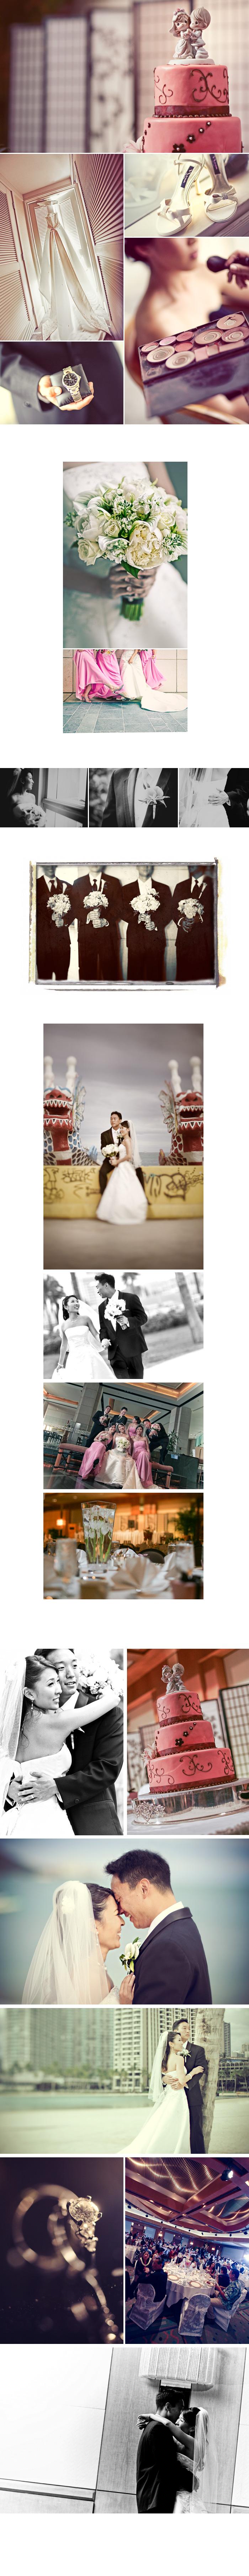 Shawn Starr : Modern Wedding Photography : Pittsburgh Wedding Photographer : Hilton Hawaiian Village